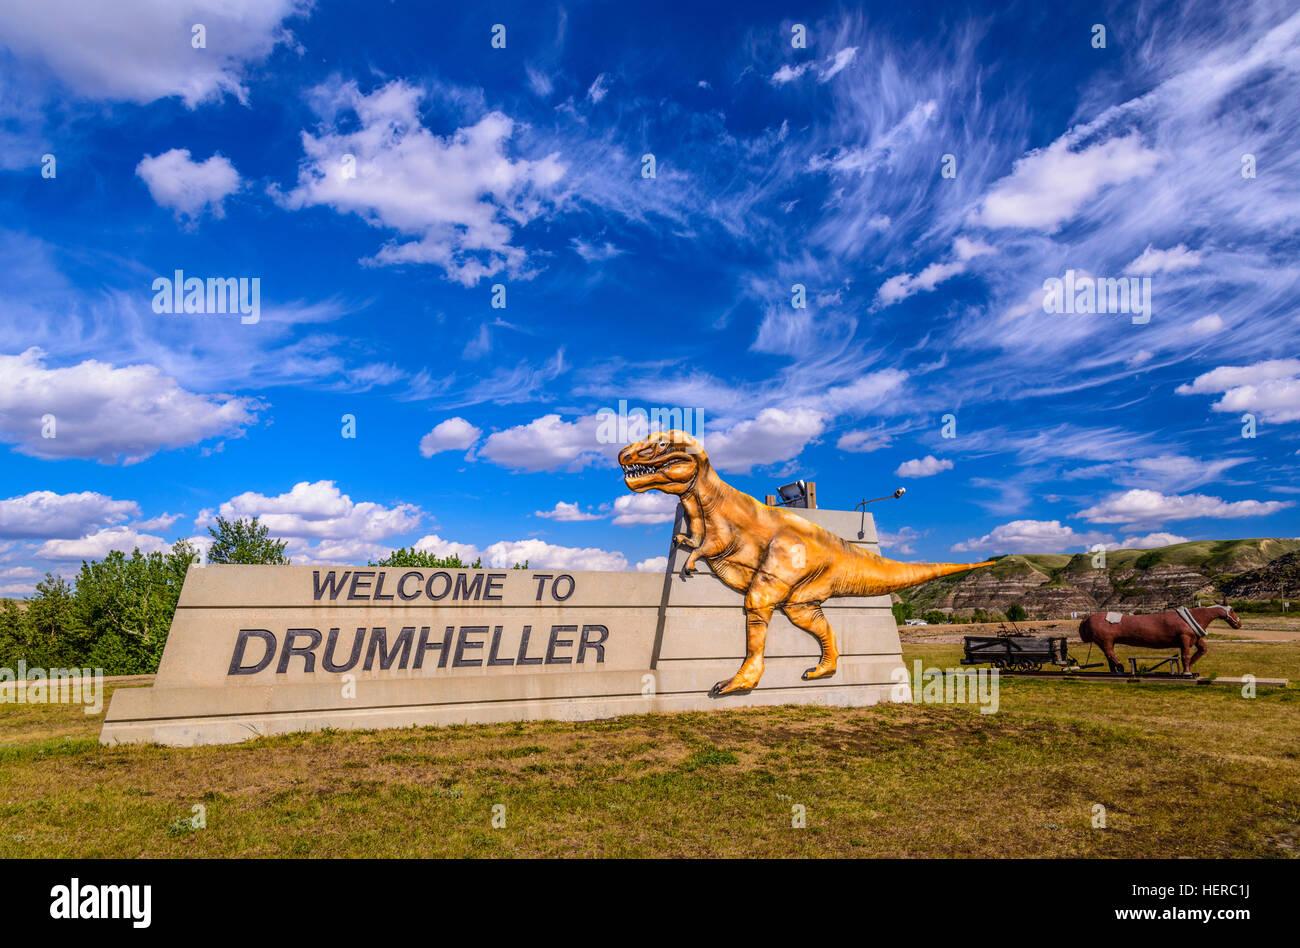 Kanada, Alberta, Canadian Badlands, Red Deer River Valley, Drumheller, South Dinosaur Trail, Nacmine, Willkommensschild, - Stock Image